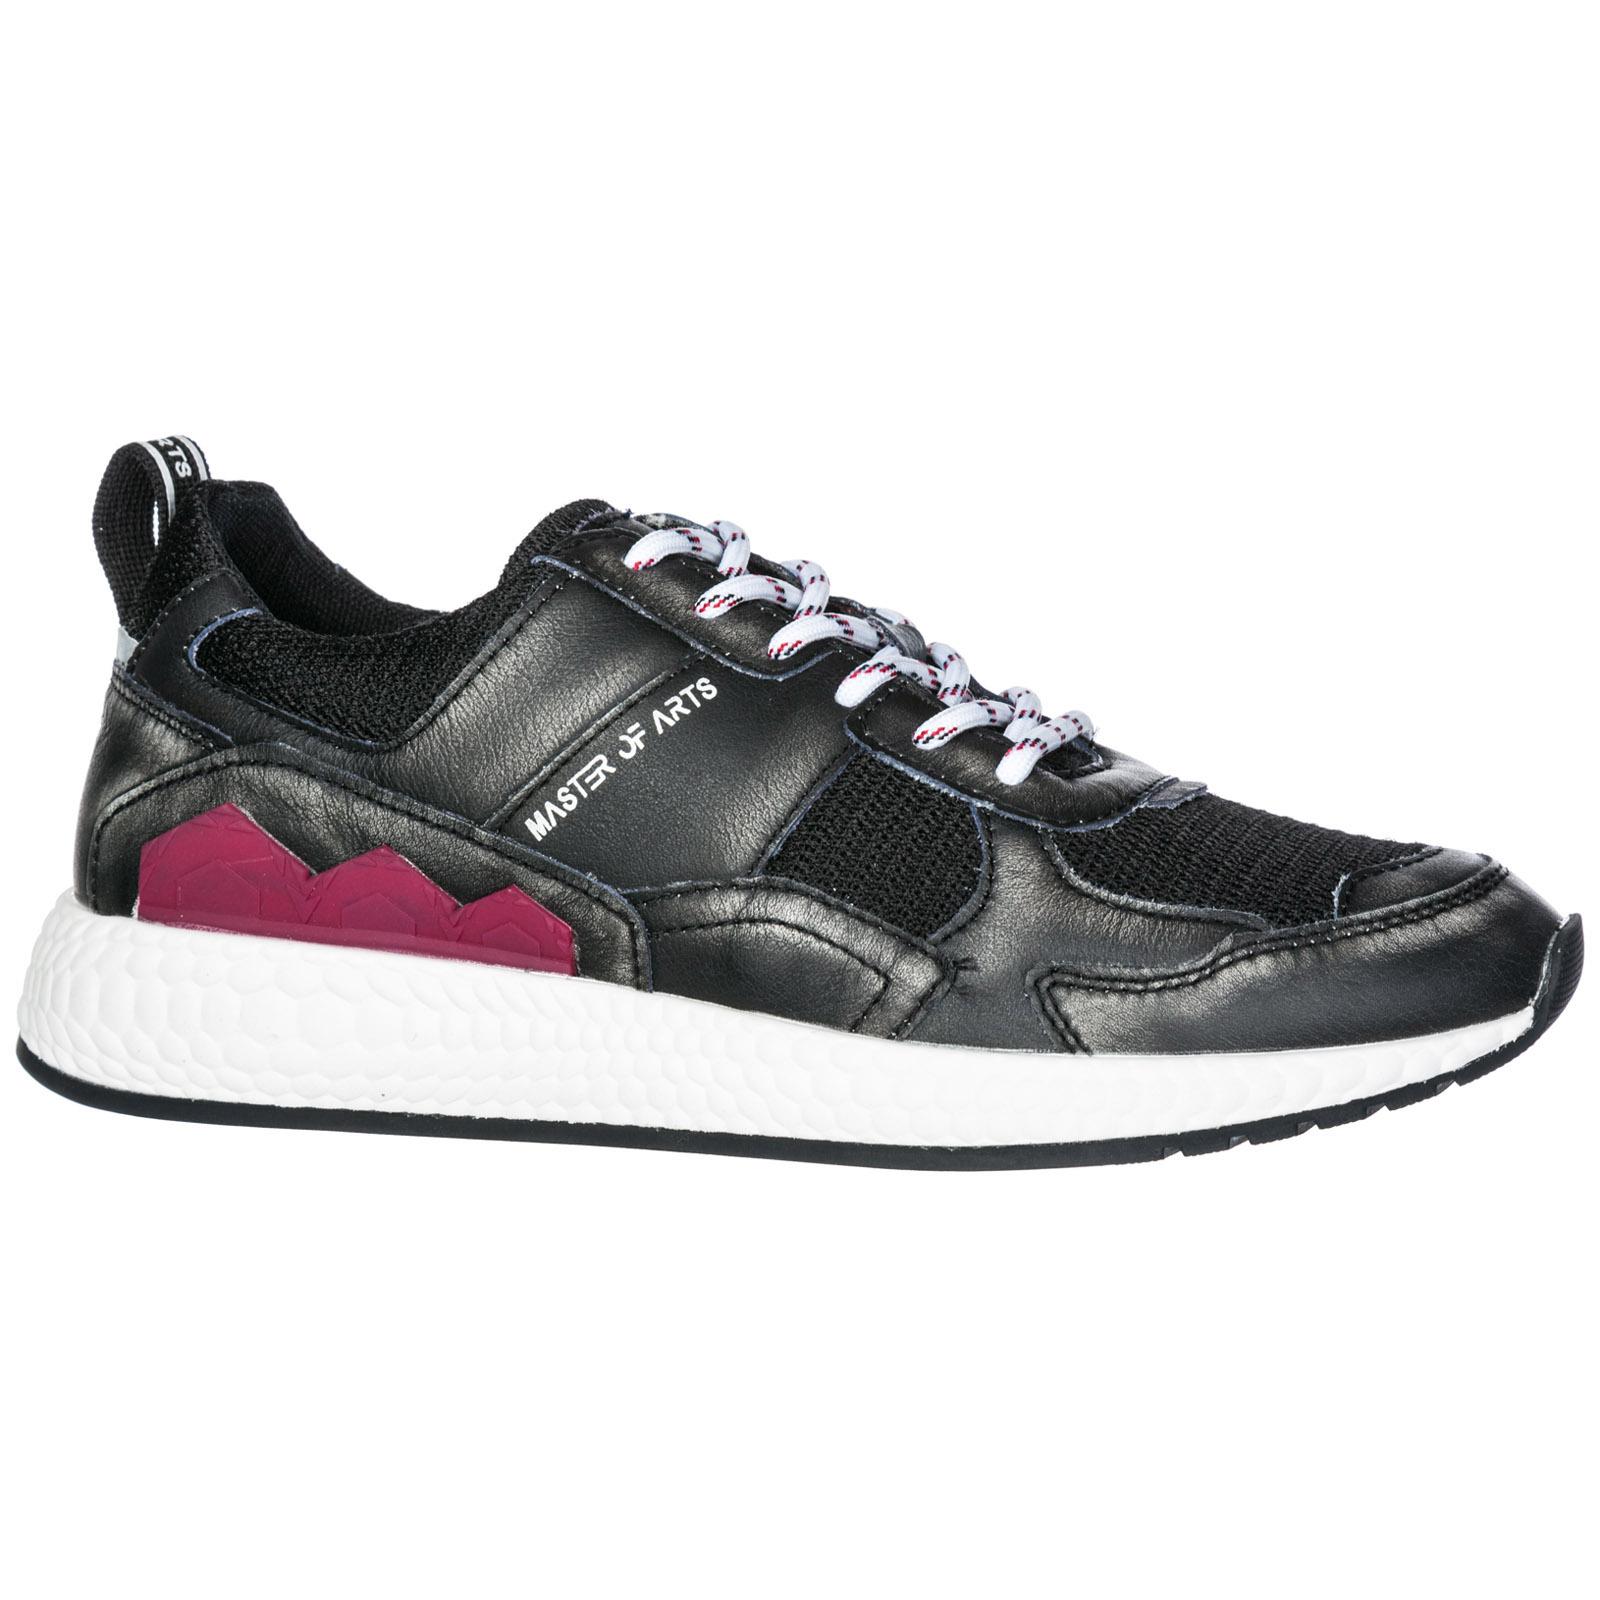 vende grande vendita stili diversi Scarpe sneakers uomo in pelle futura